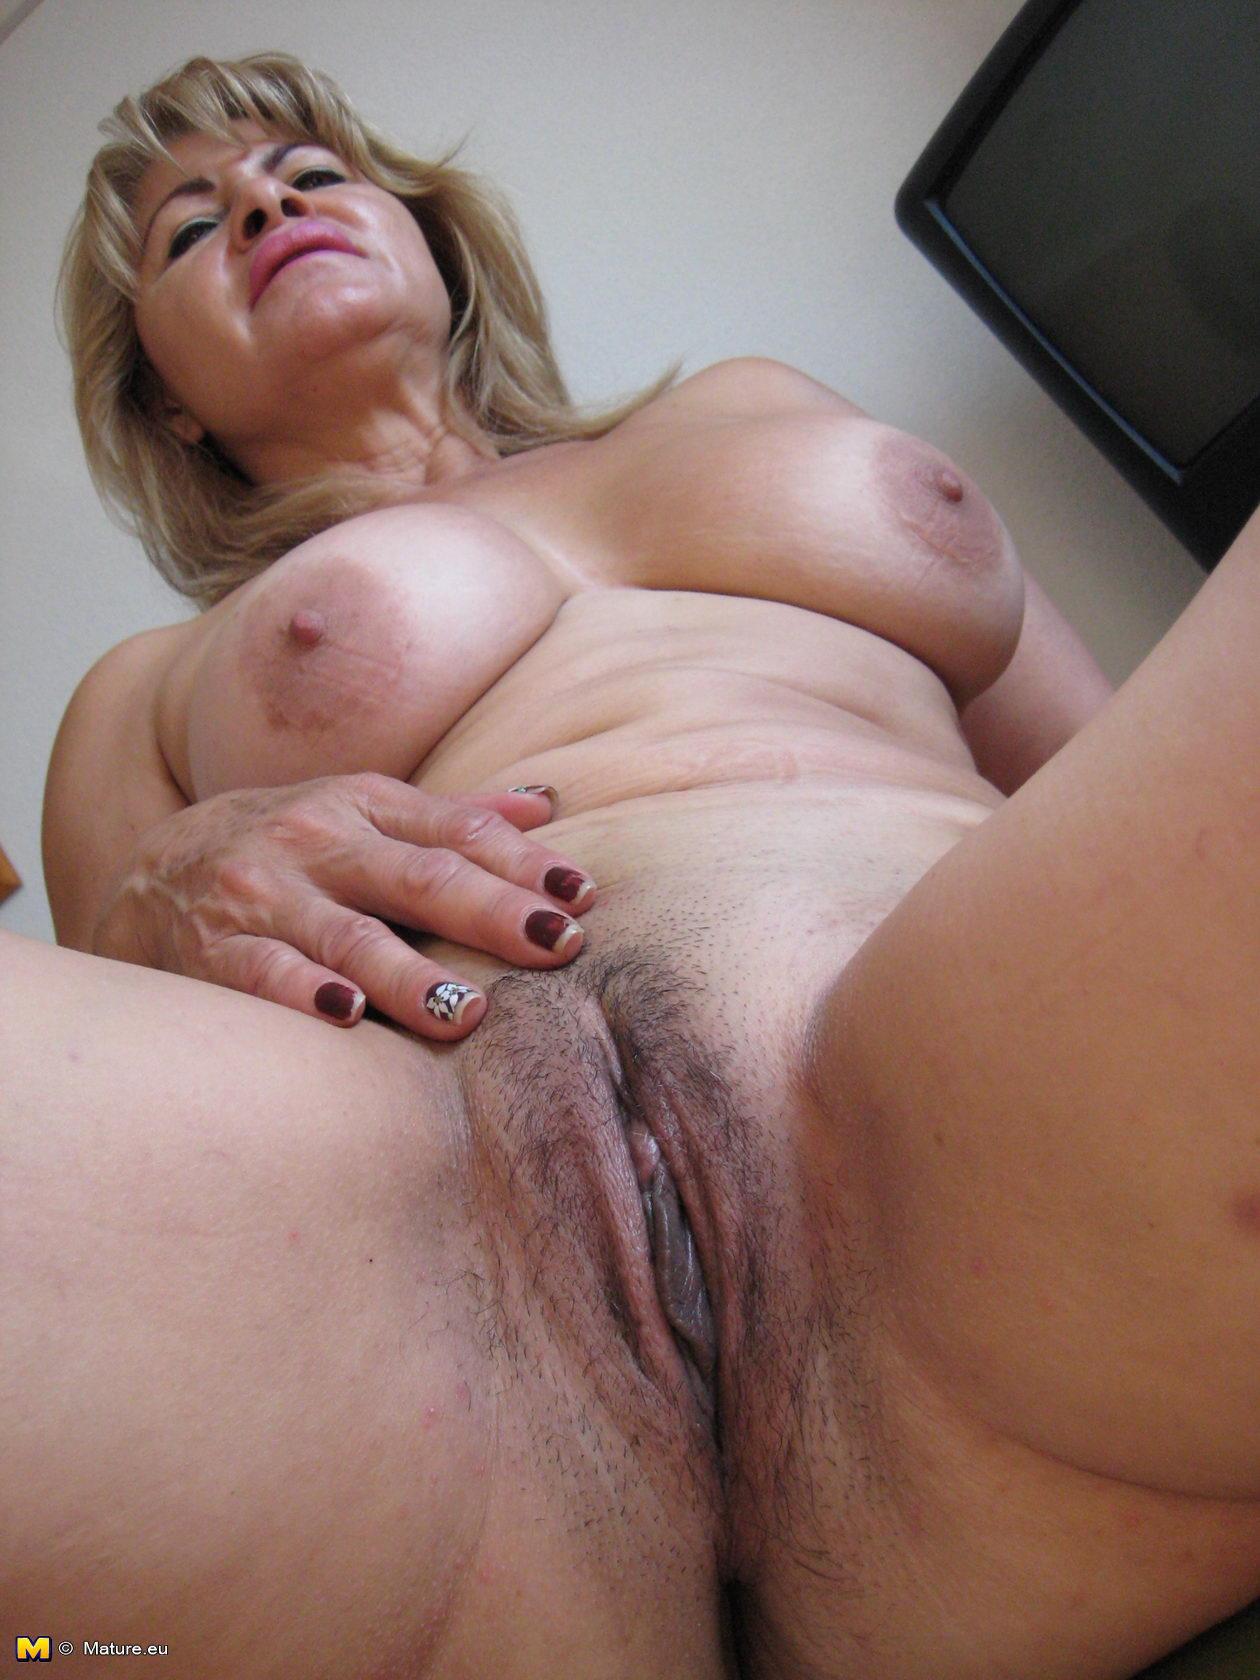 Bbw eu naked pics